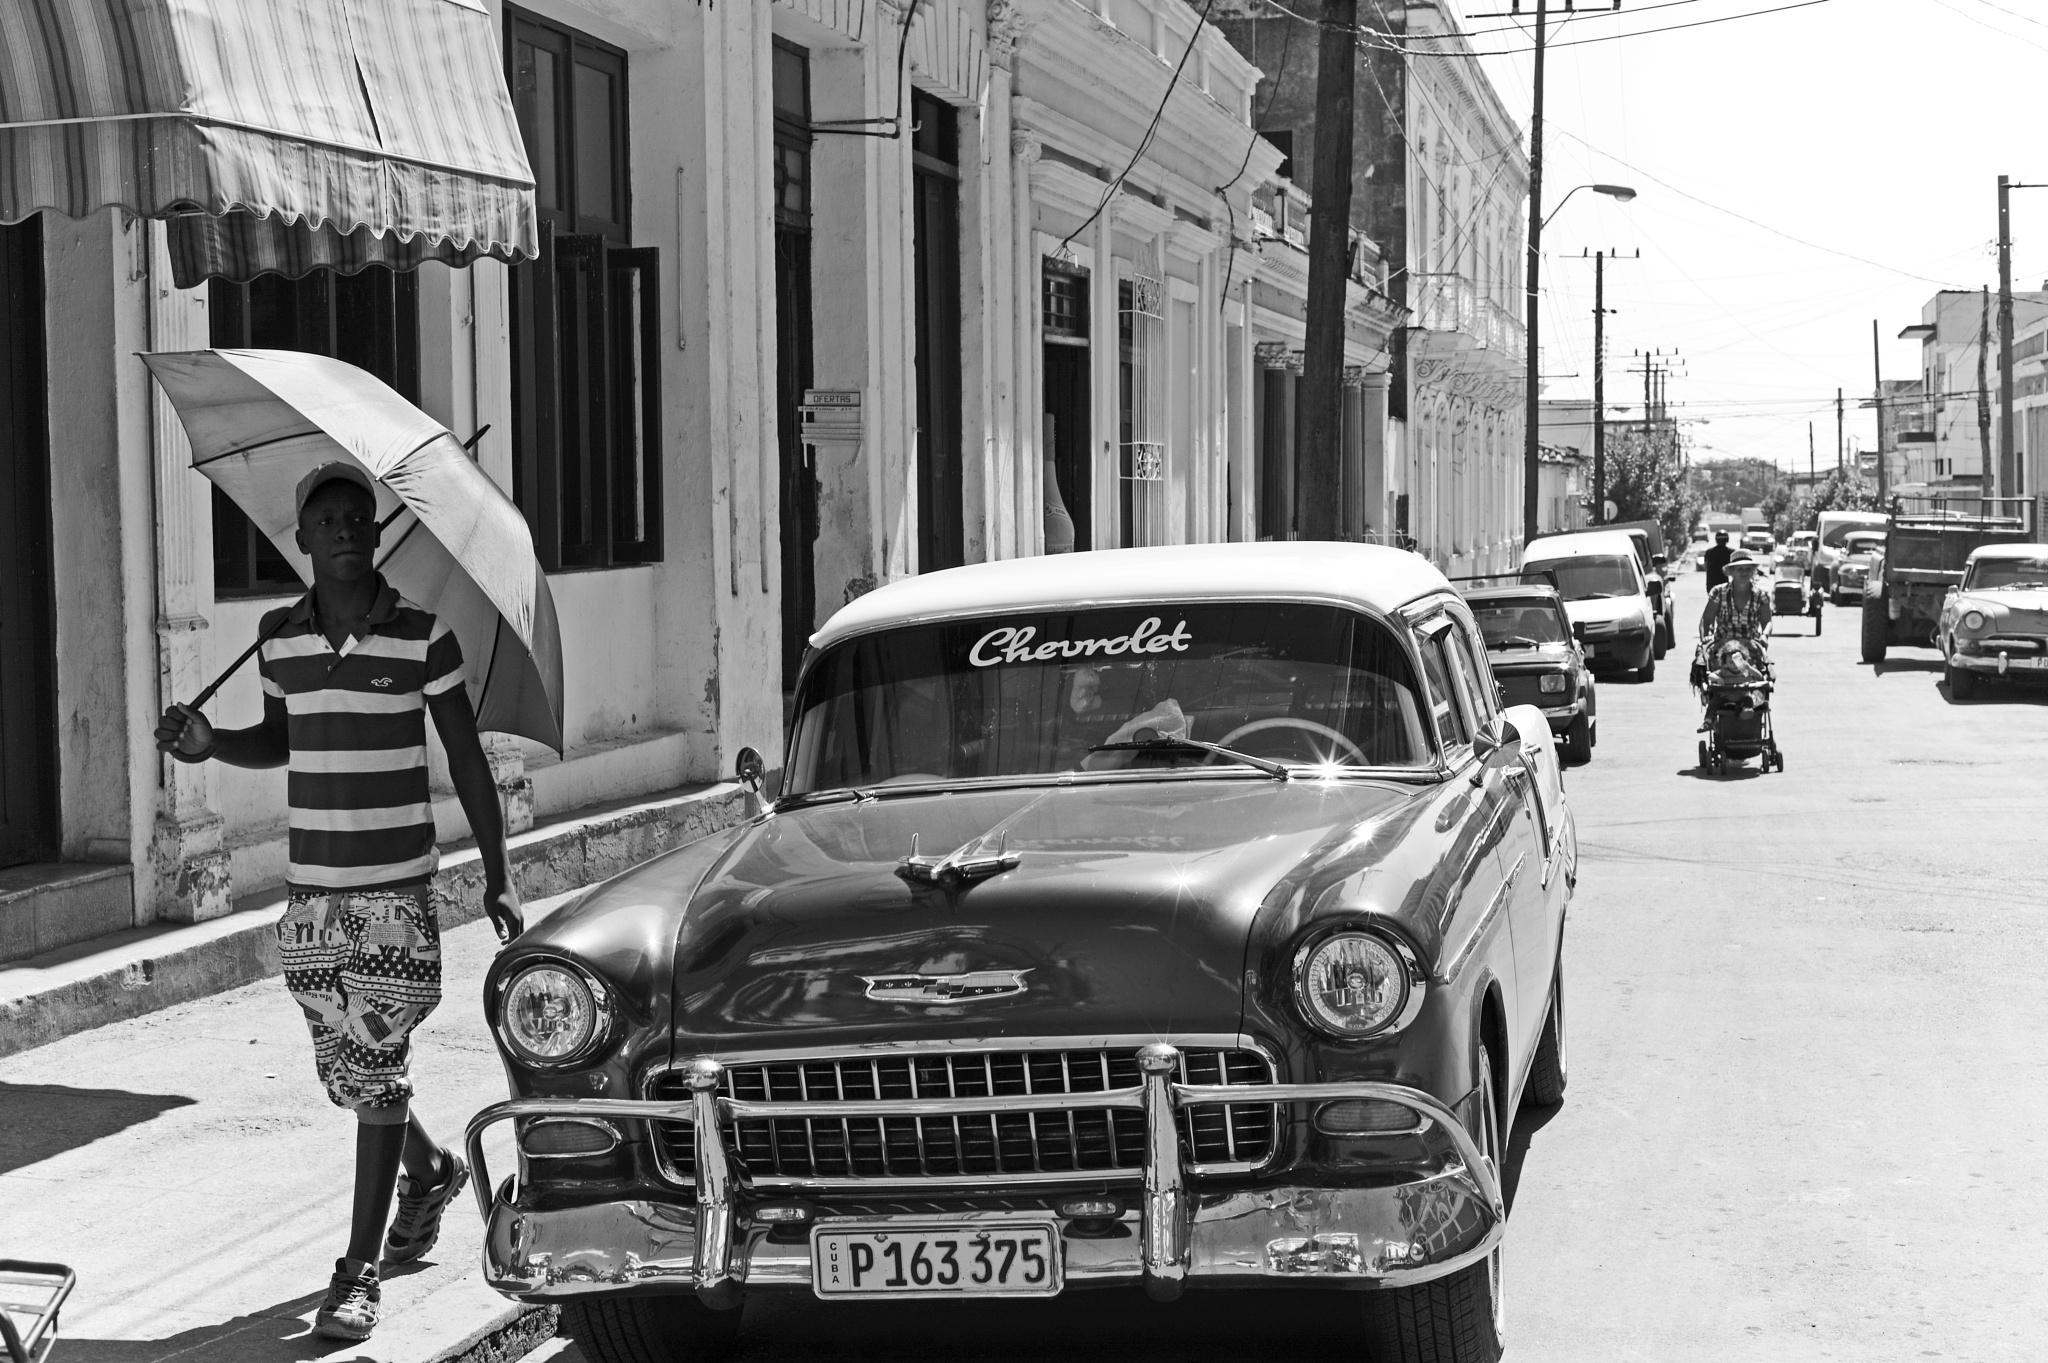 Old Chevrolet in Cienfuegos Cuba by le-chapelier.alain